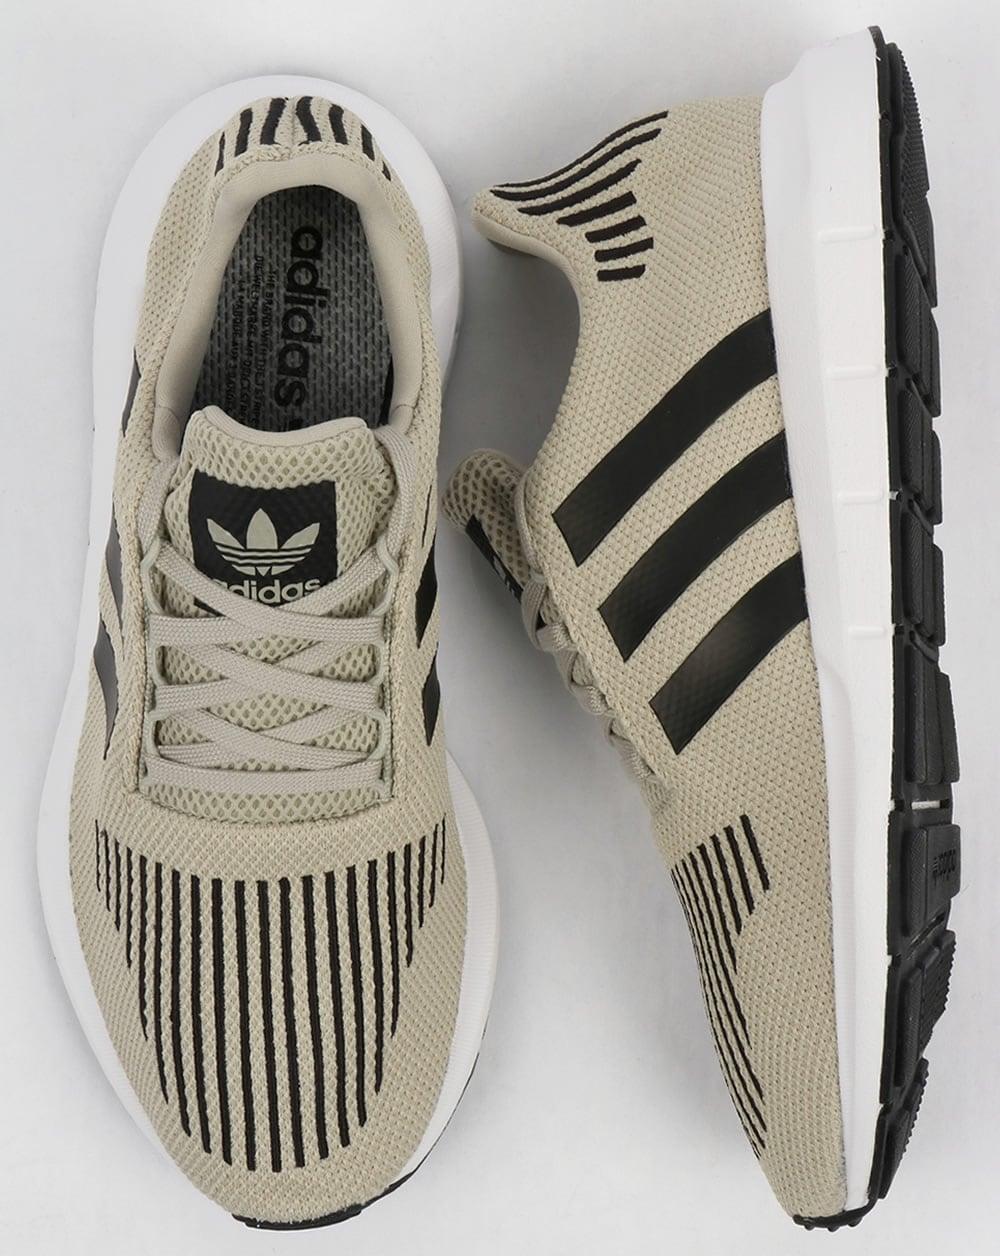 1e080f172f284 Adidas Swift Run Trainers Sesame Black White